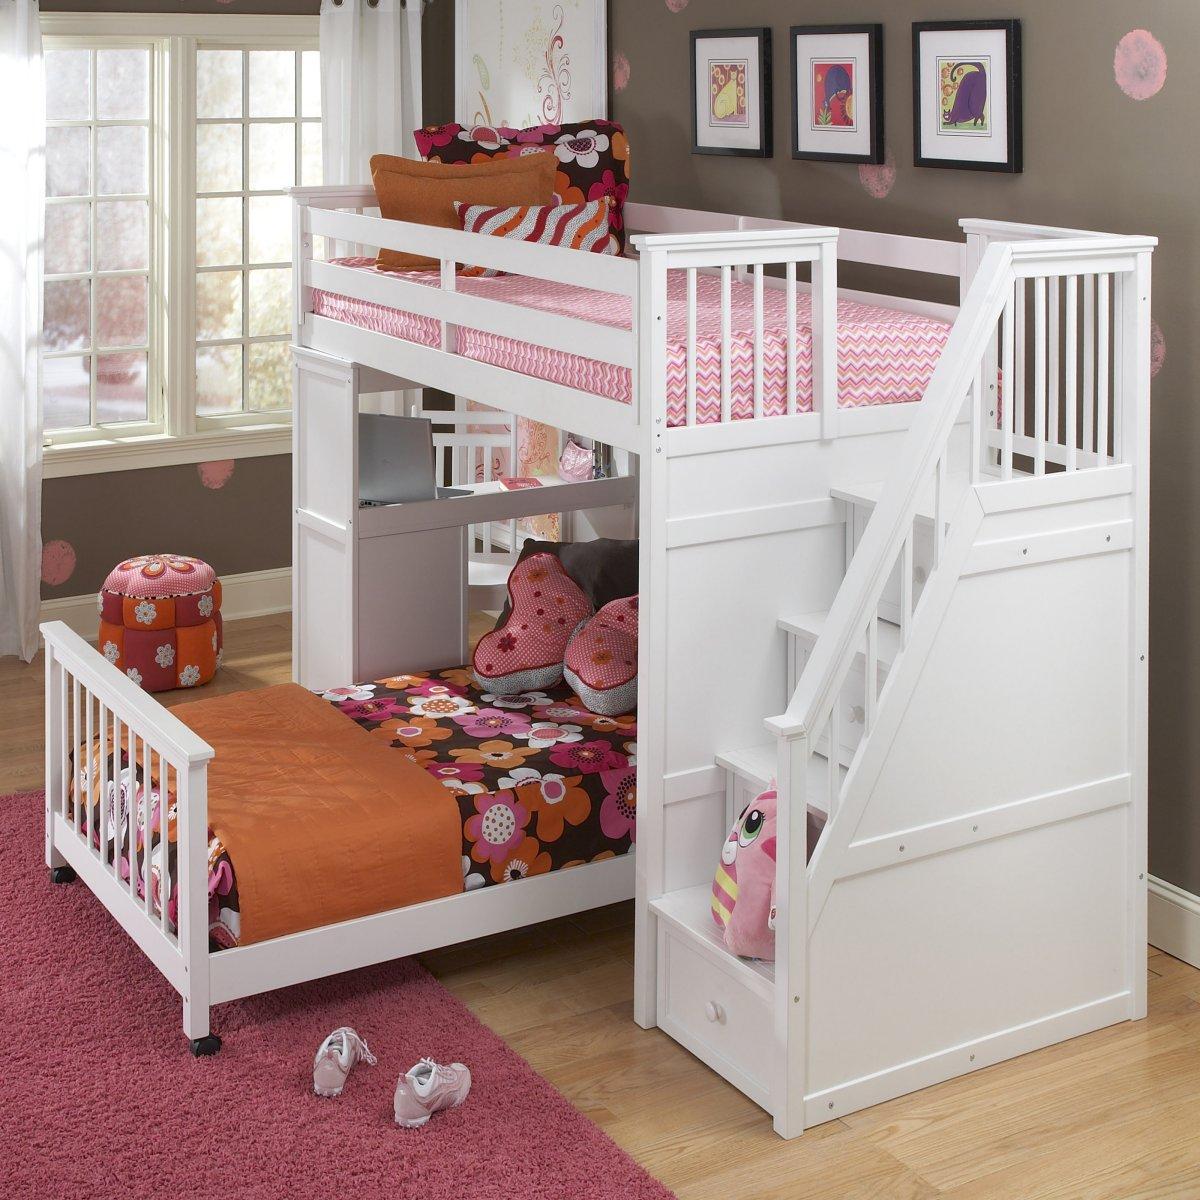 Toddler Bunk Beds Safety Guide Home Design